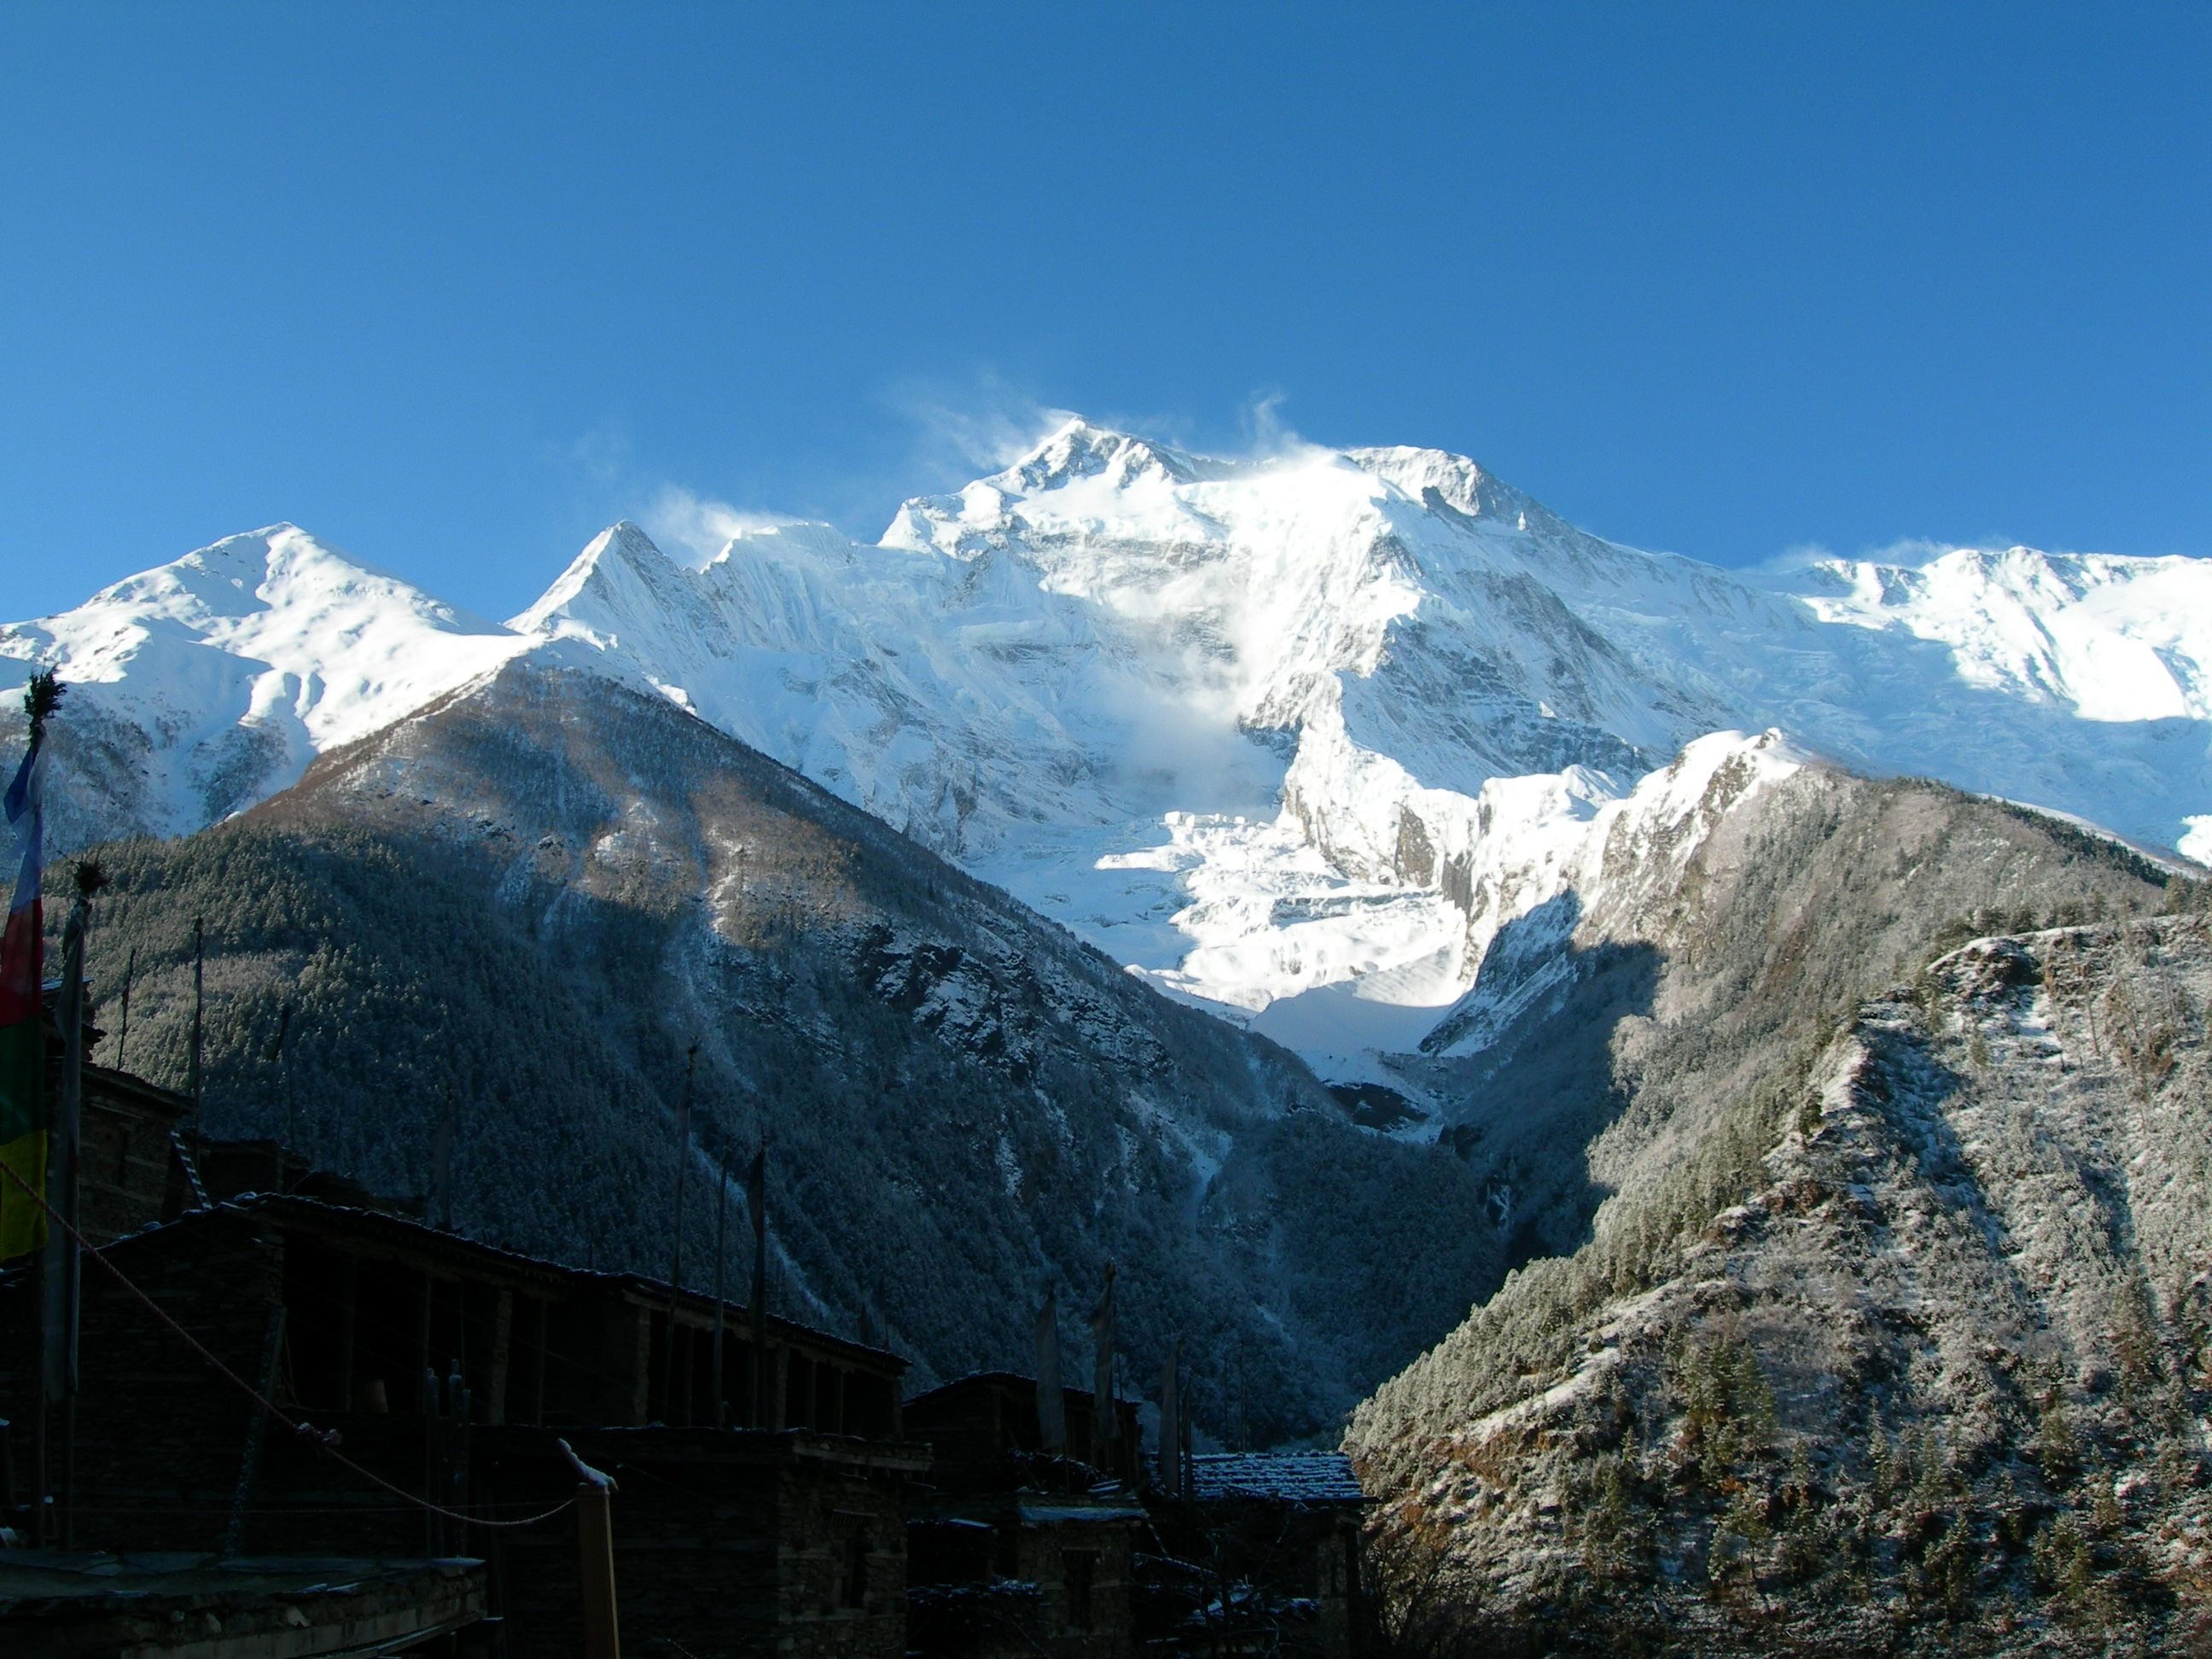 Nepal, Annapurna circuit